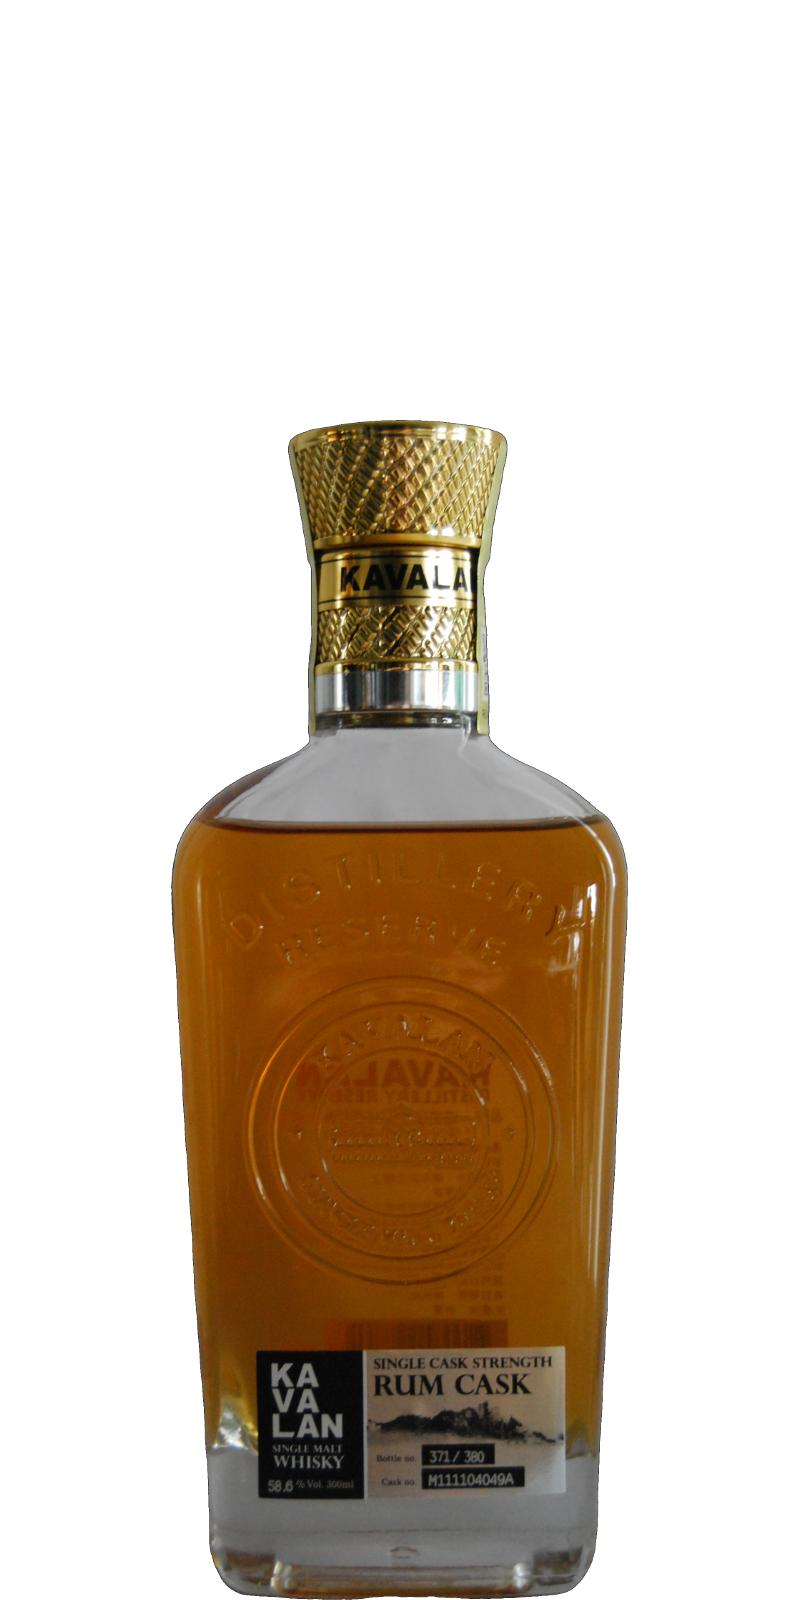 Kavalan Rum Cask